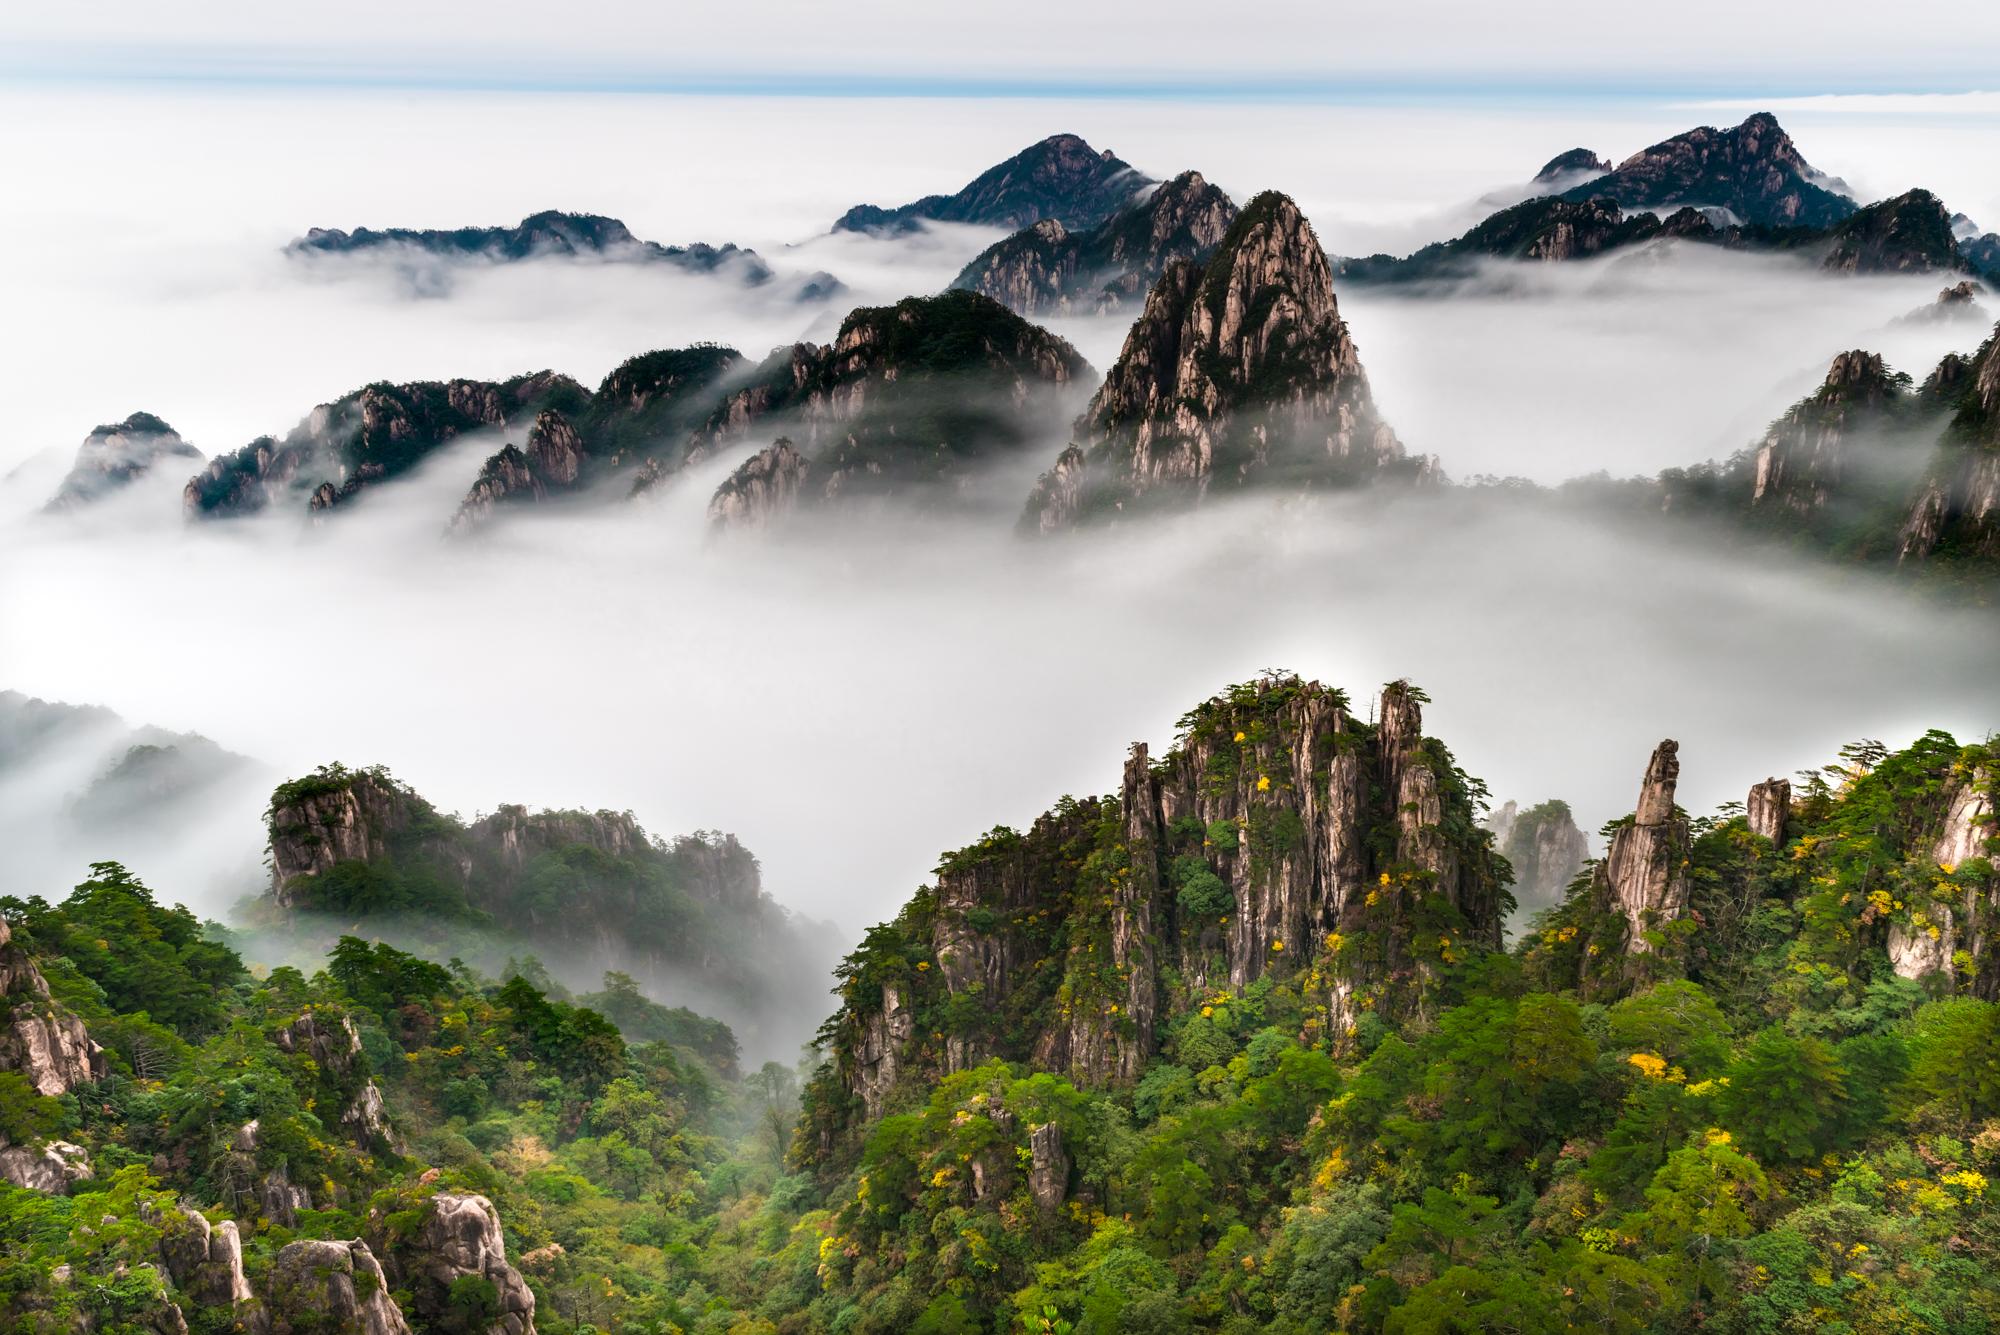 """云·游中国""系列线上展览——安徽篇 Visiting China Online – Anhui Province"